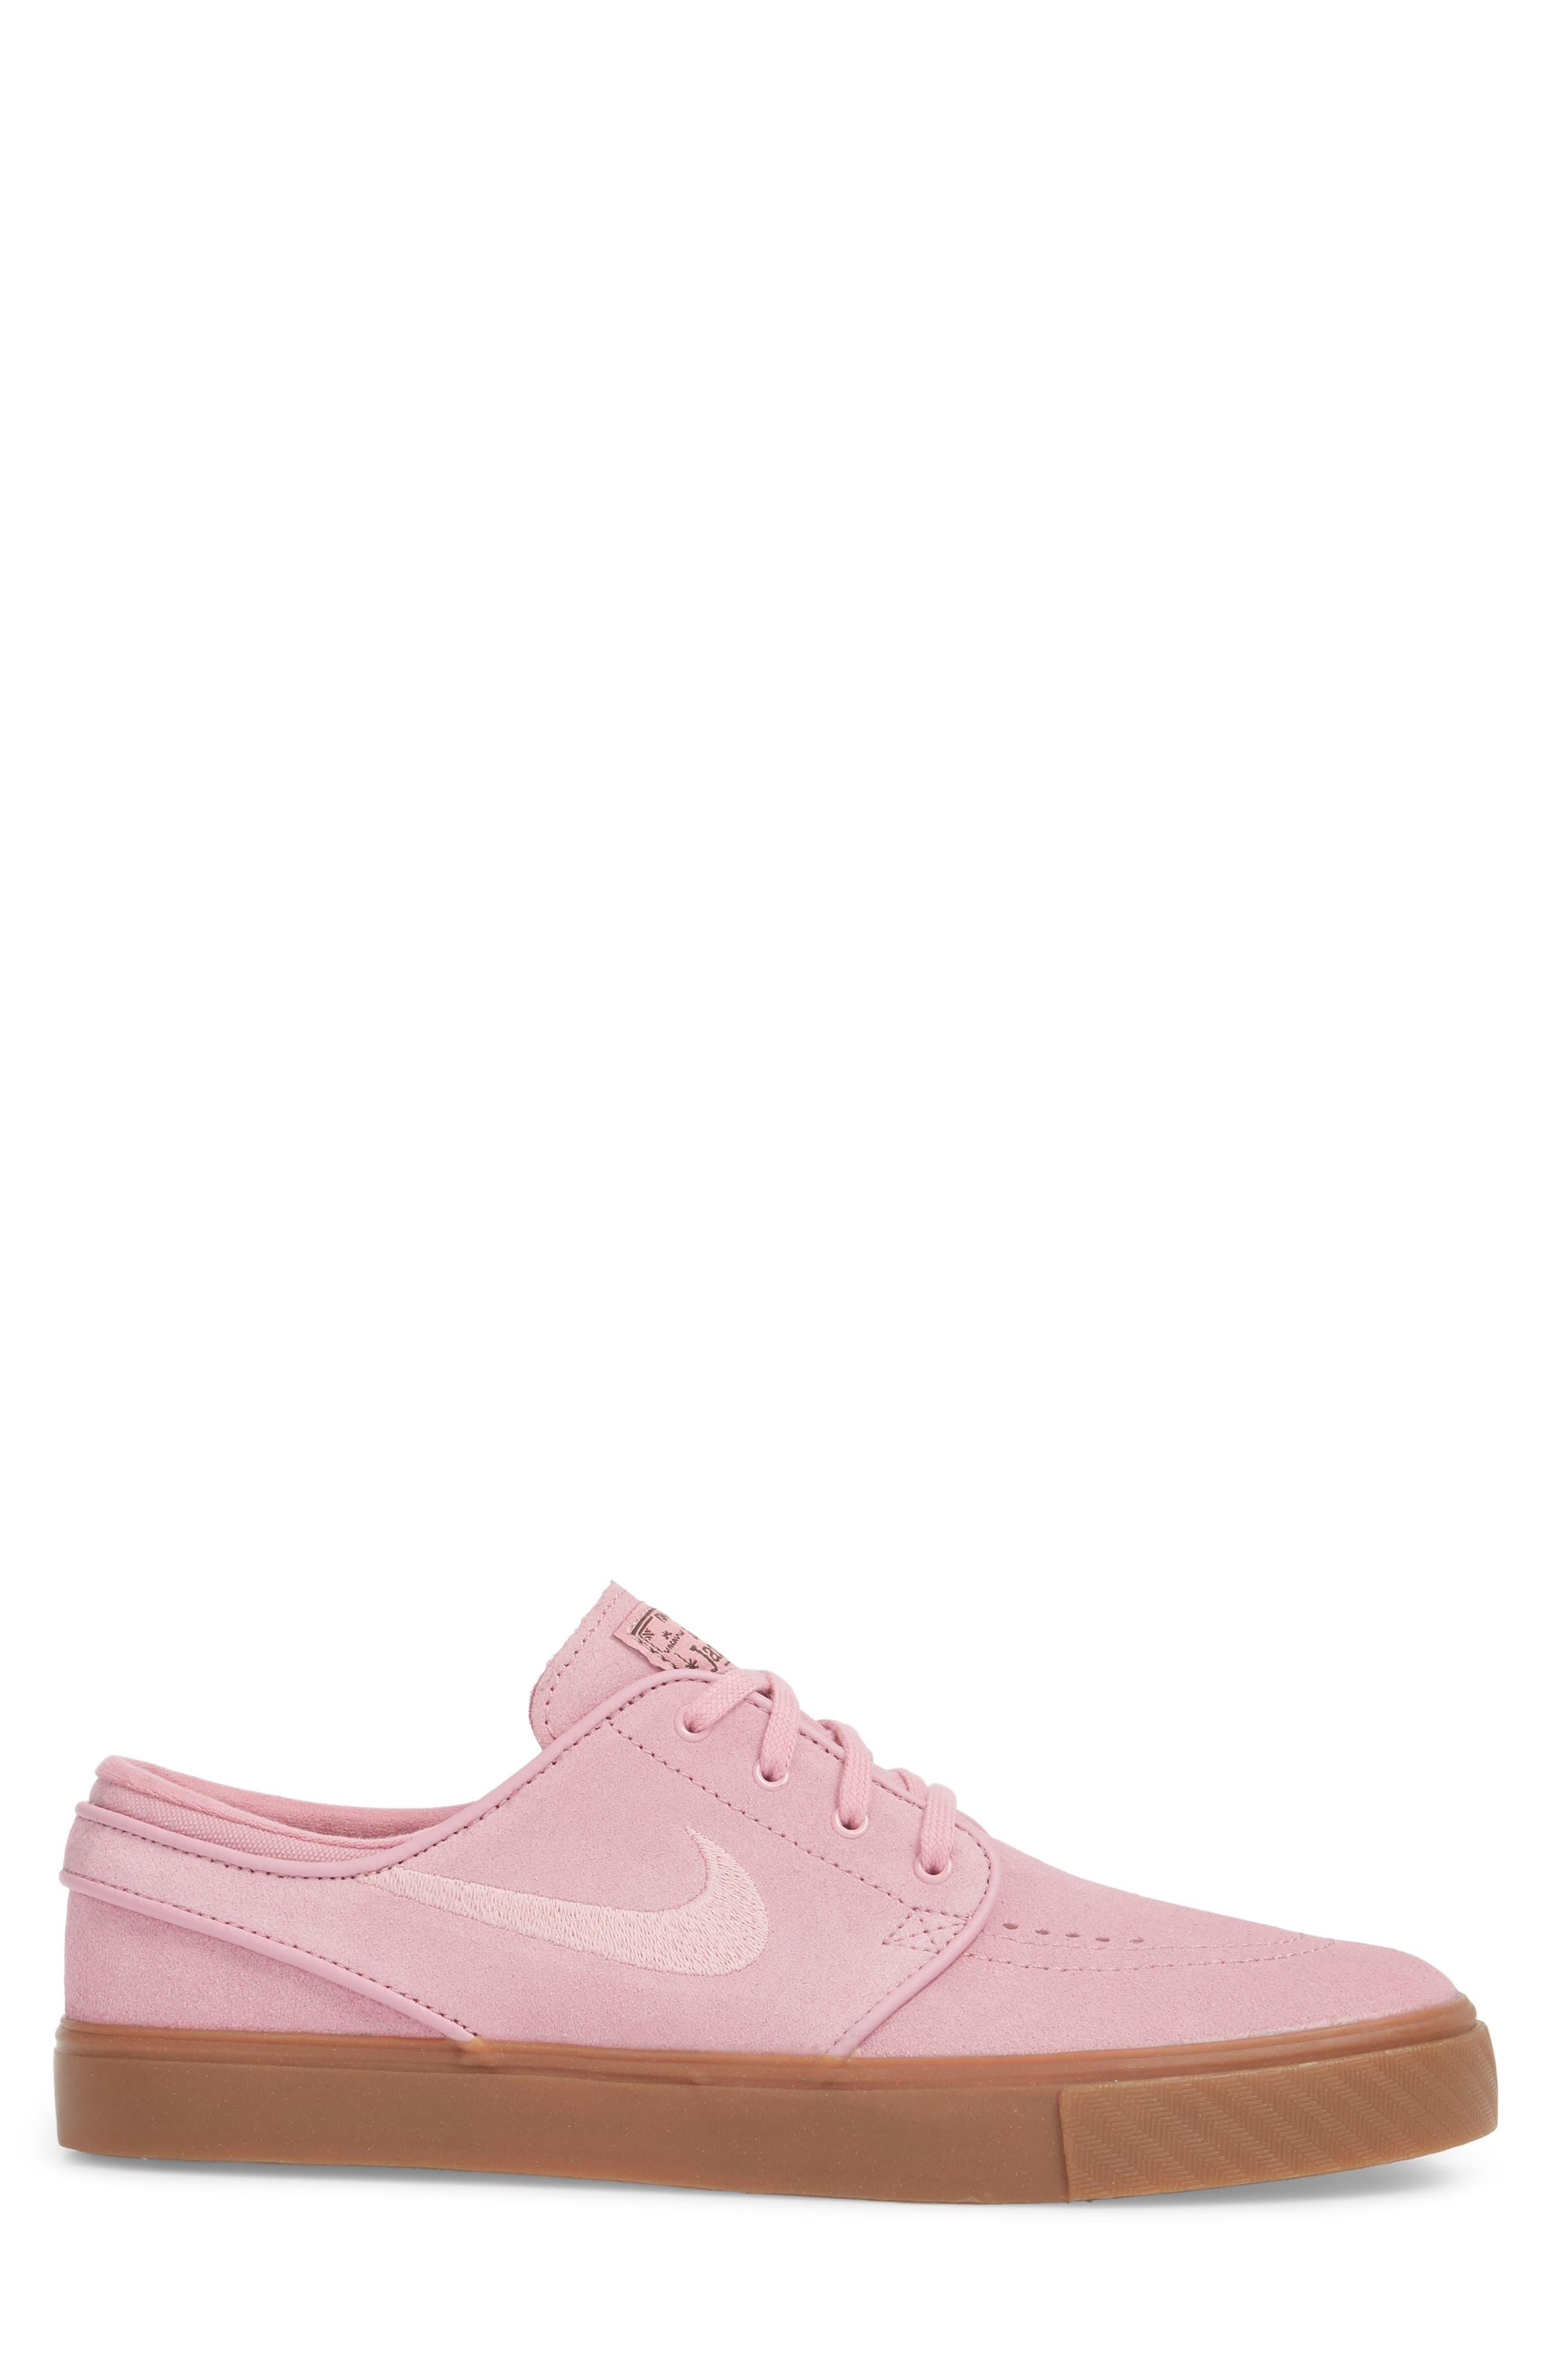 Alternate Image 3  - Nike 'Zoom - Stefan Janoski' Skate Shoe (Men)